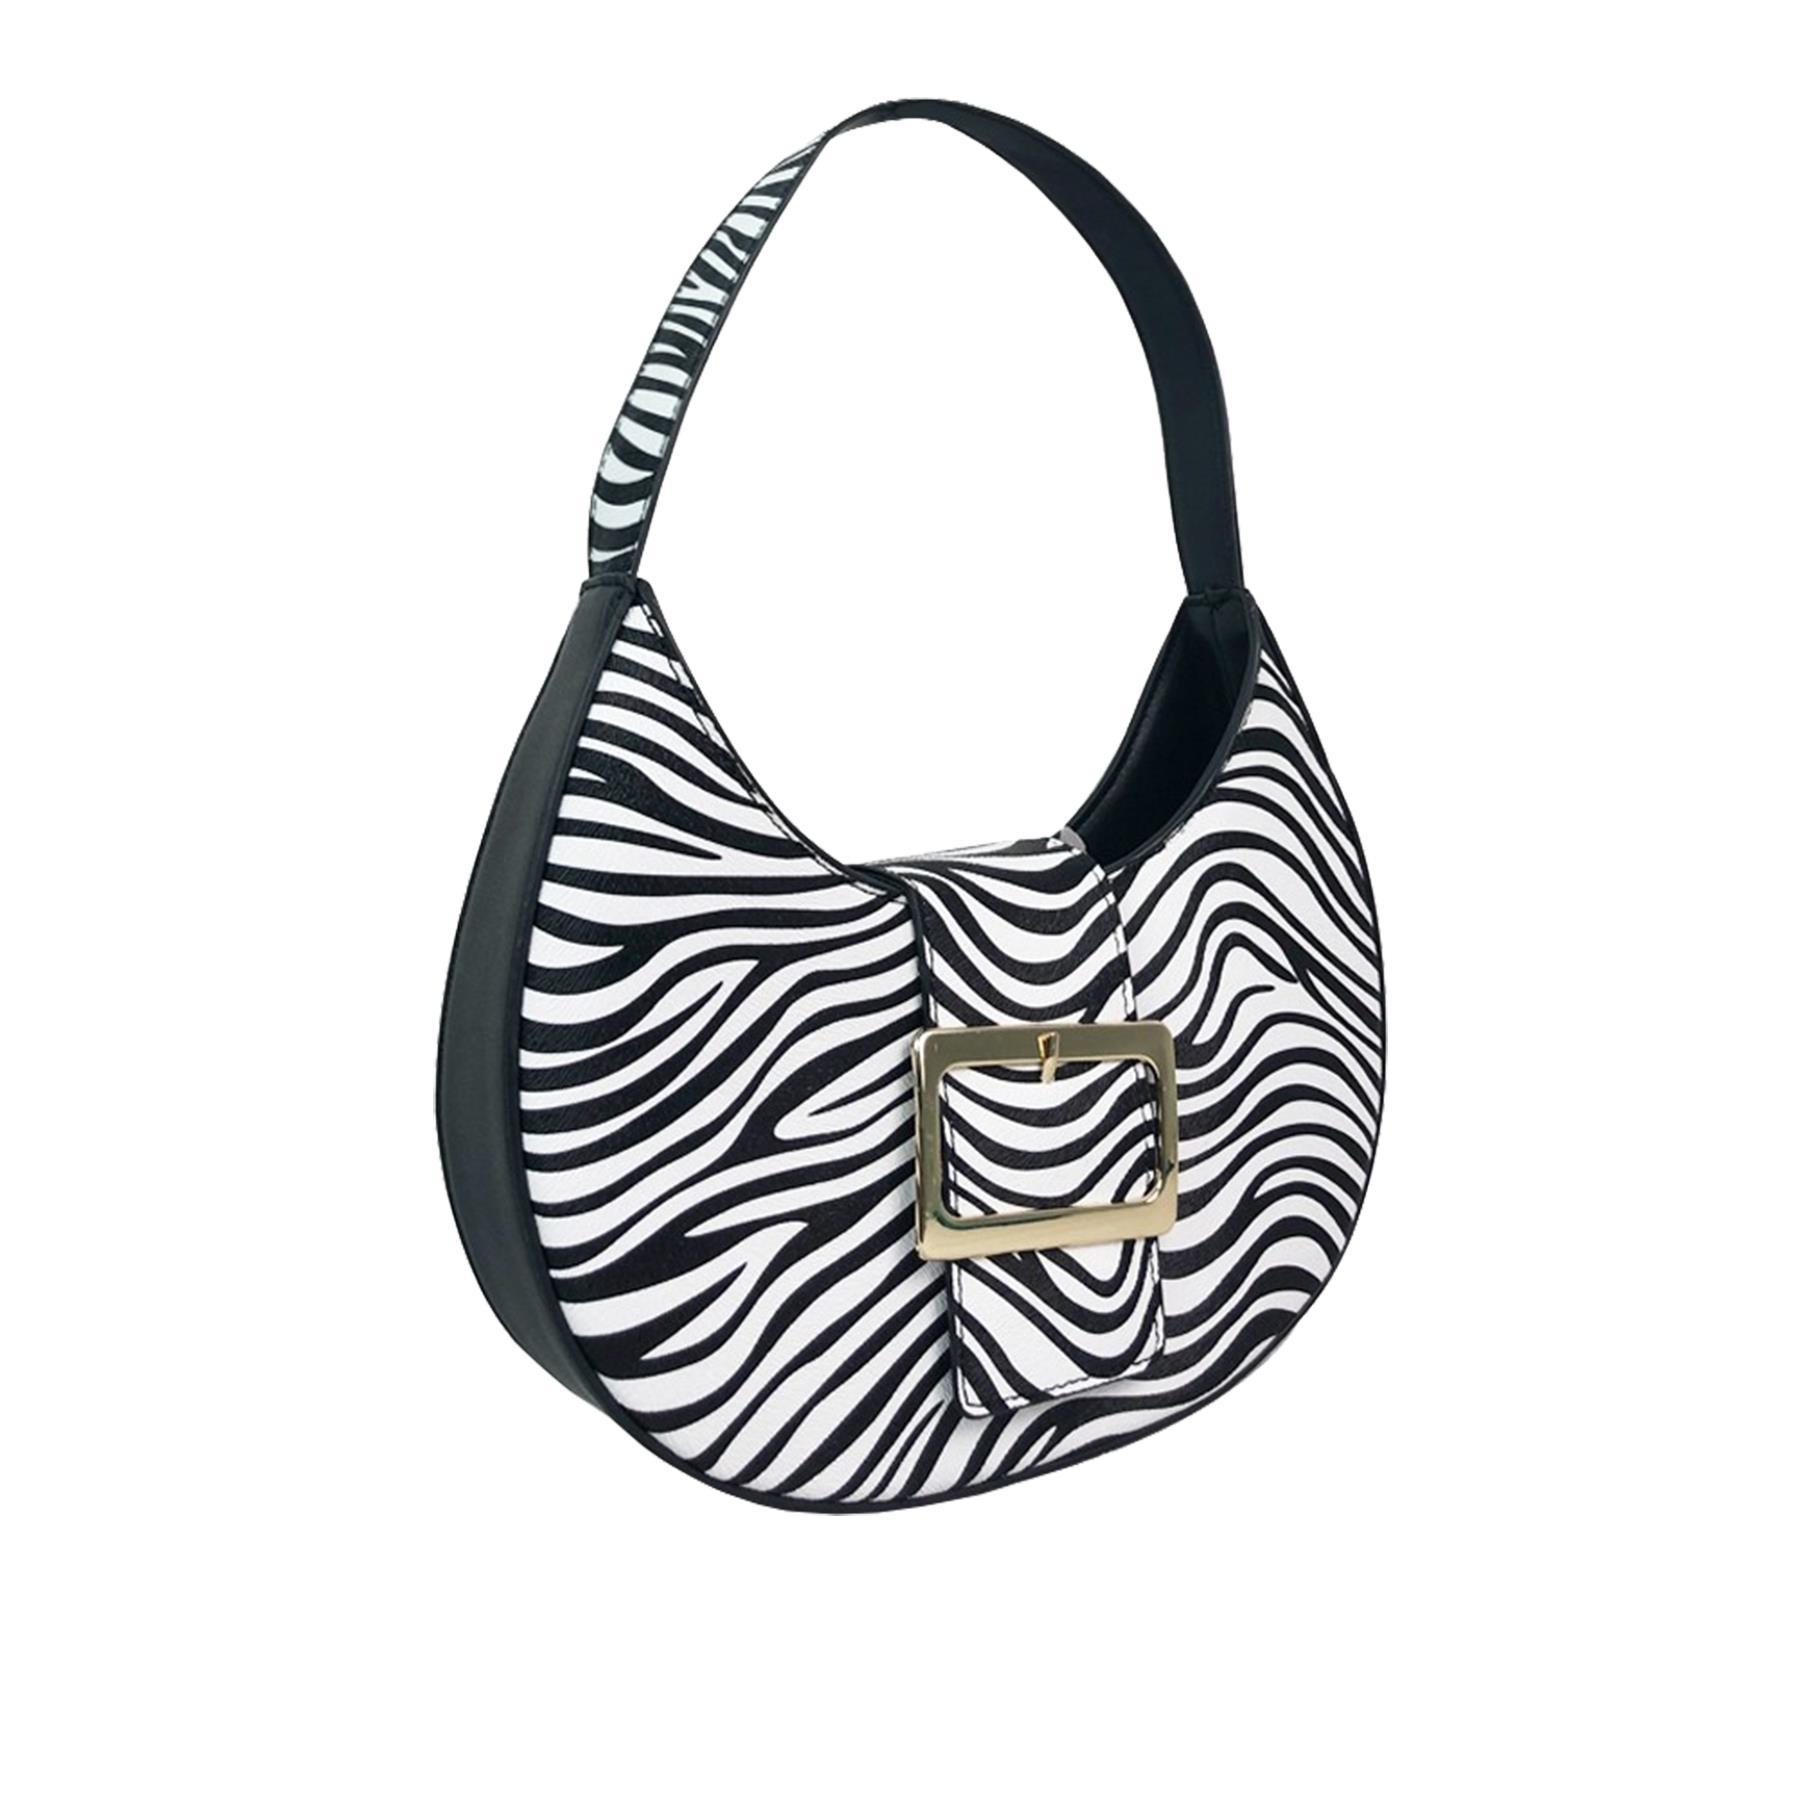 New-Women-s-Zebra-Leopard-Print-Faux-Leather-Fashion-Shoulder-Bags thumbnail 6